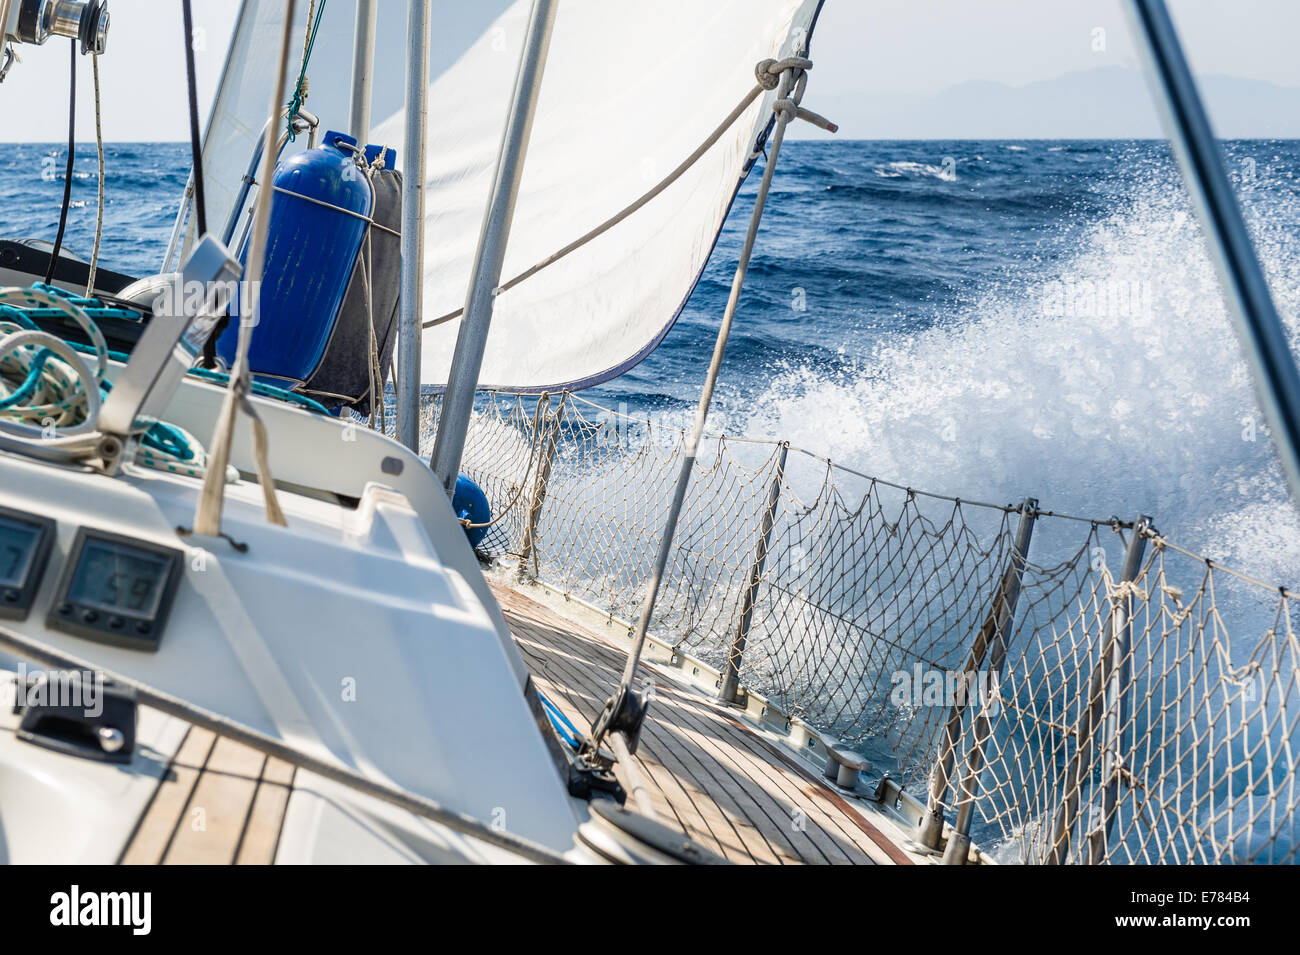 Fast sailing cruising yacht at heeling - Stock Image